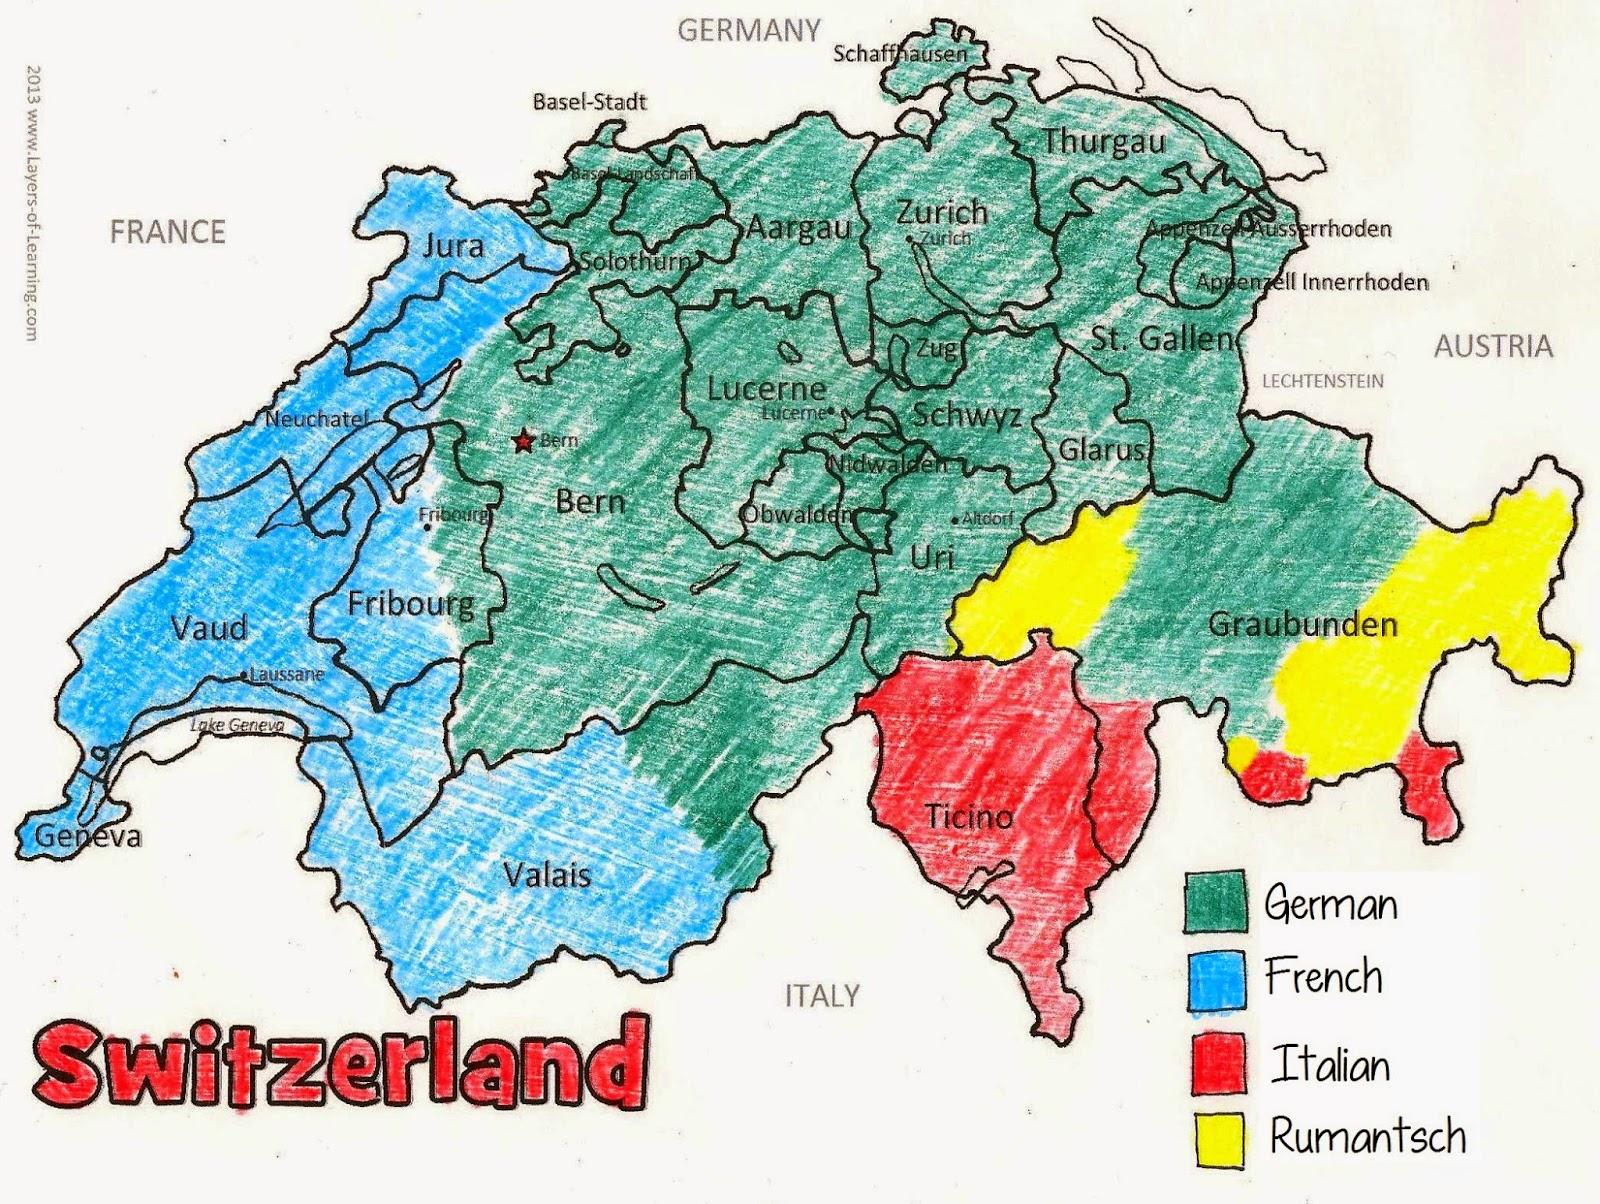 Switzerland Map Of Languages - Languages map of switzerland